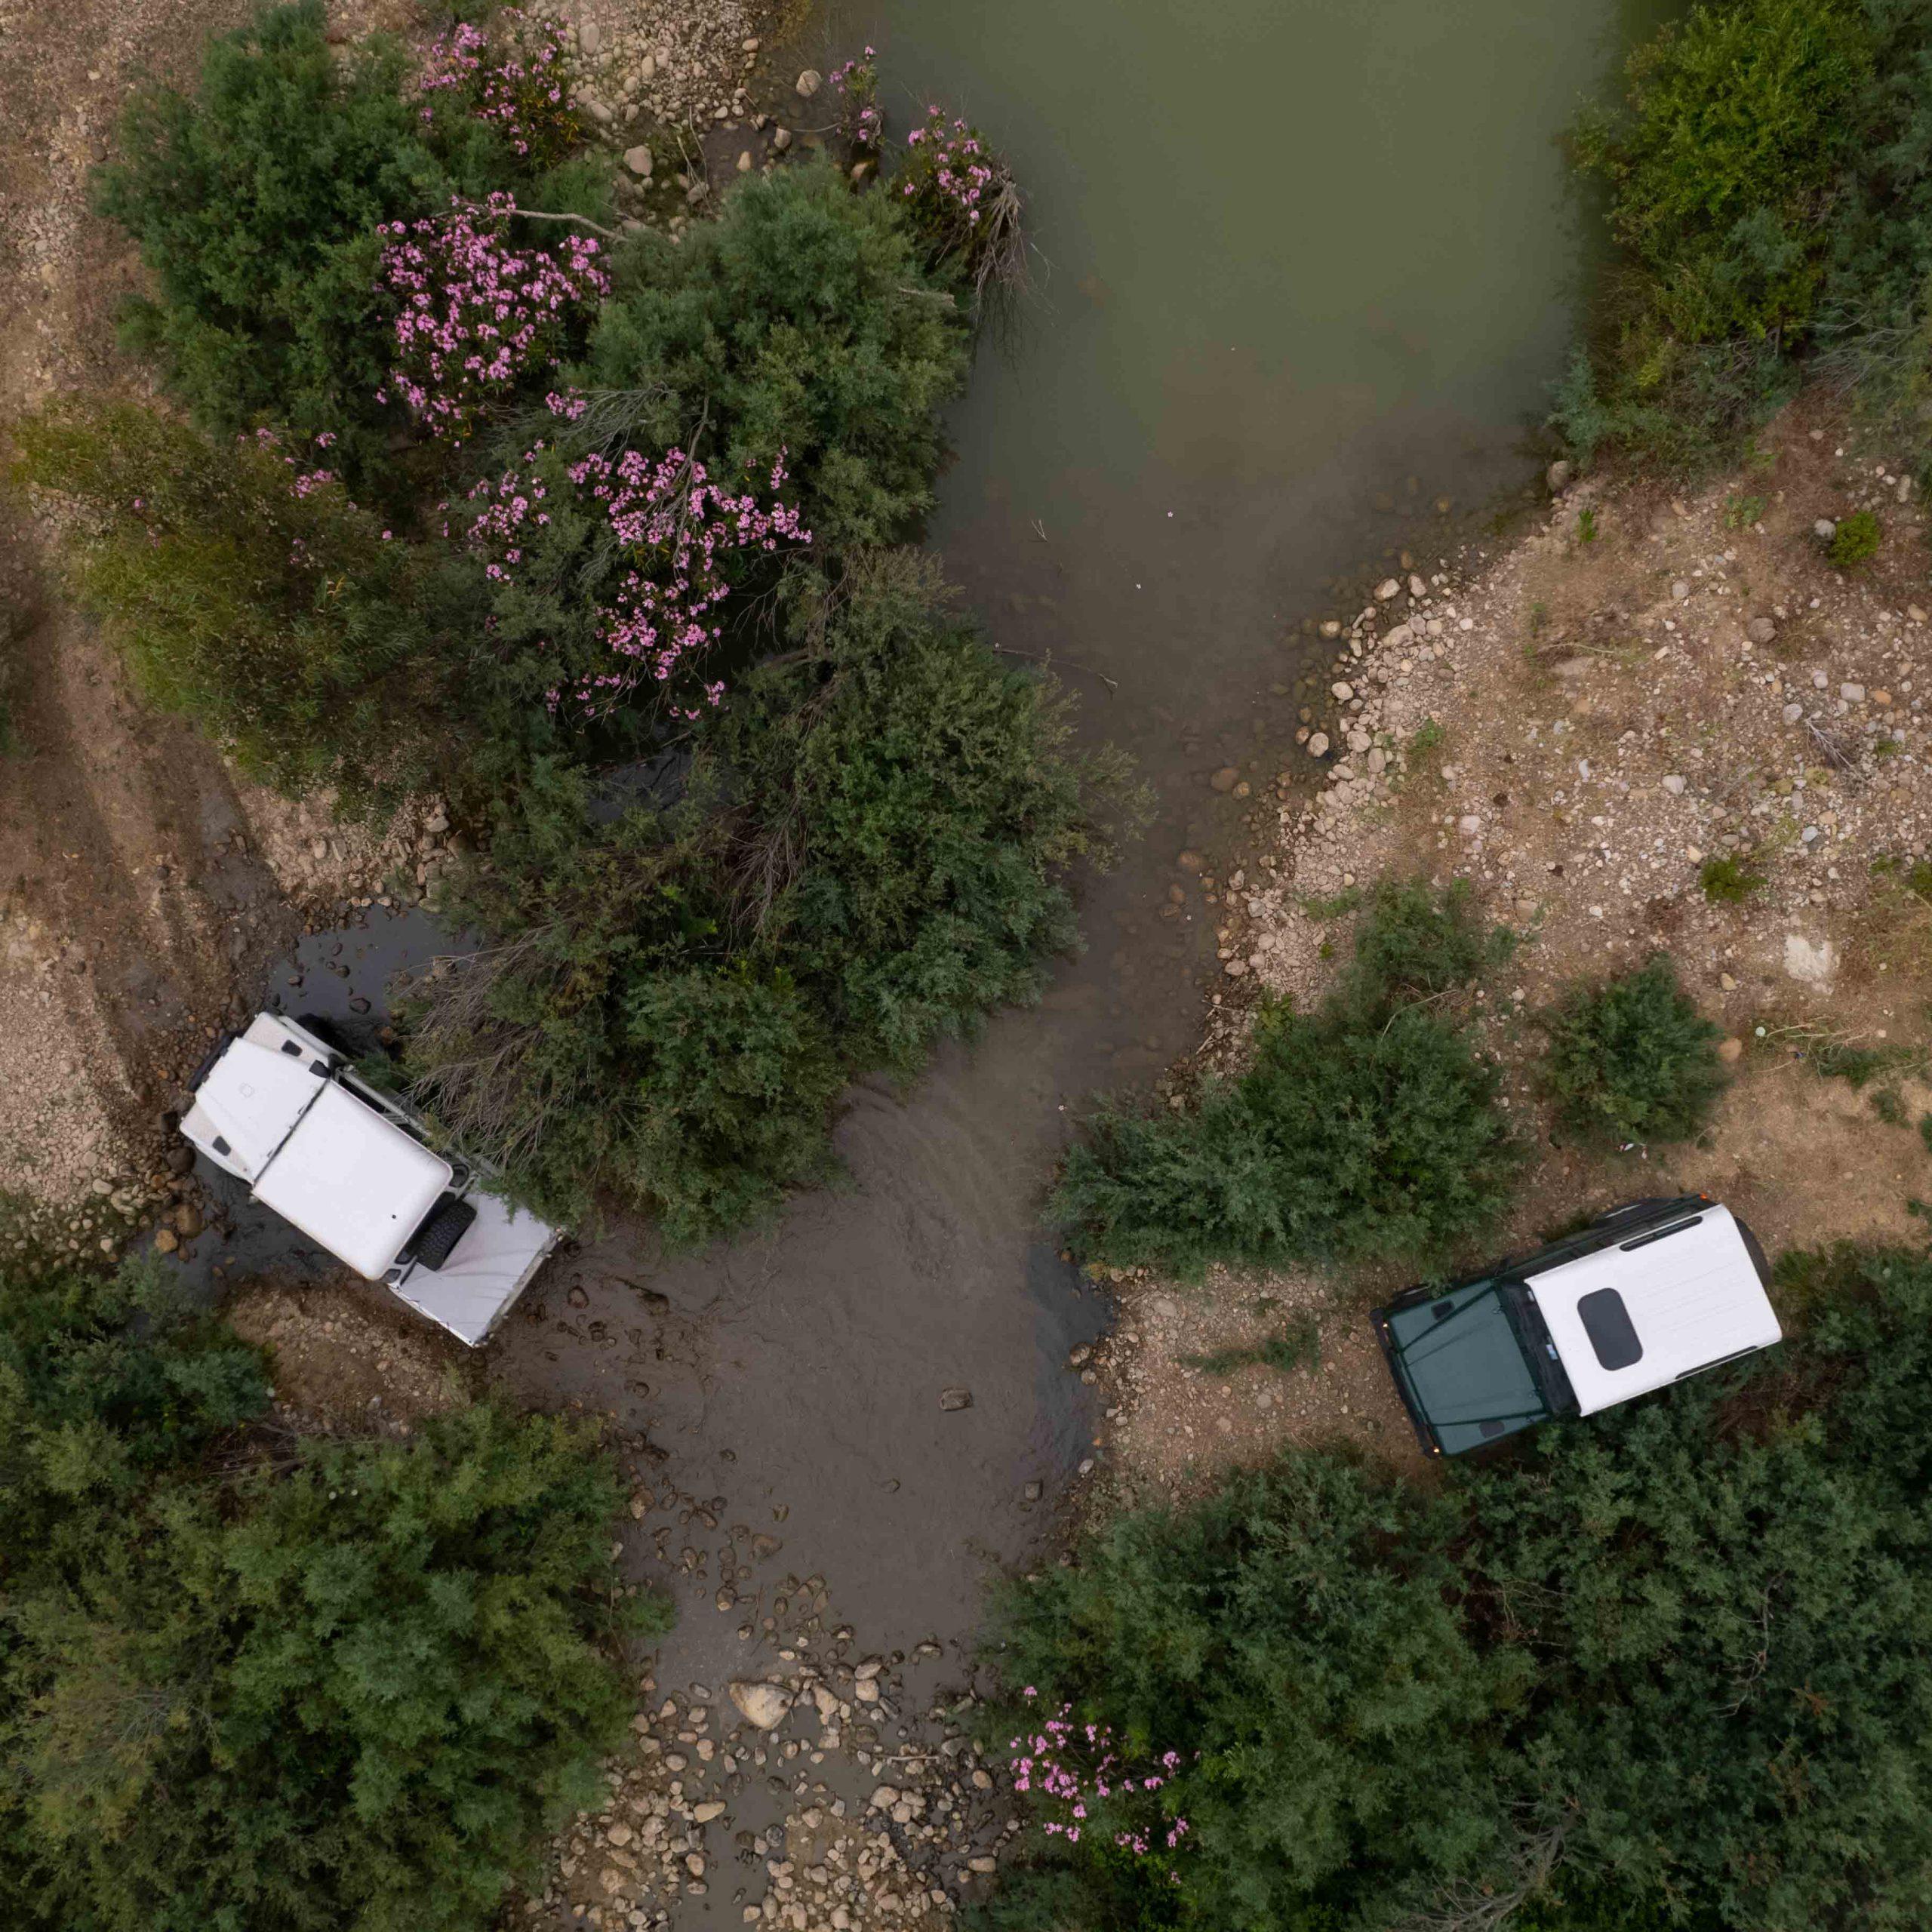 Land_Rover_Tour_Sicilia_2021_Land_Rover_Experience_Italia_-41